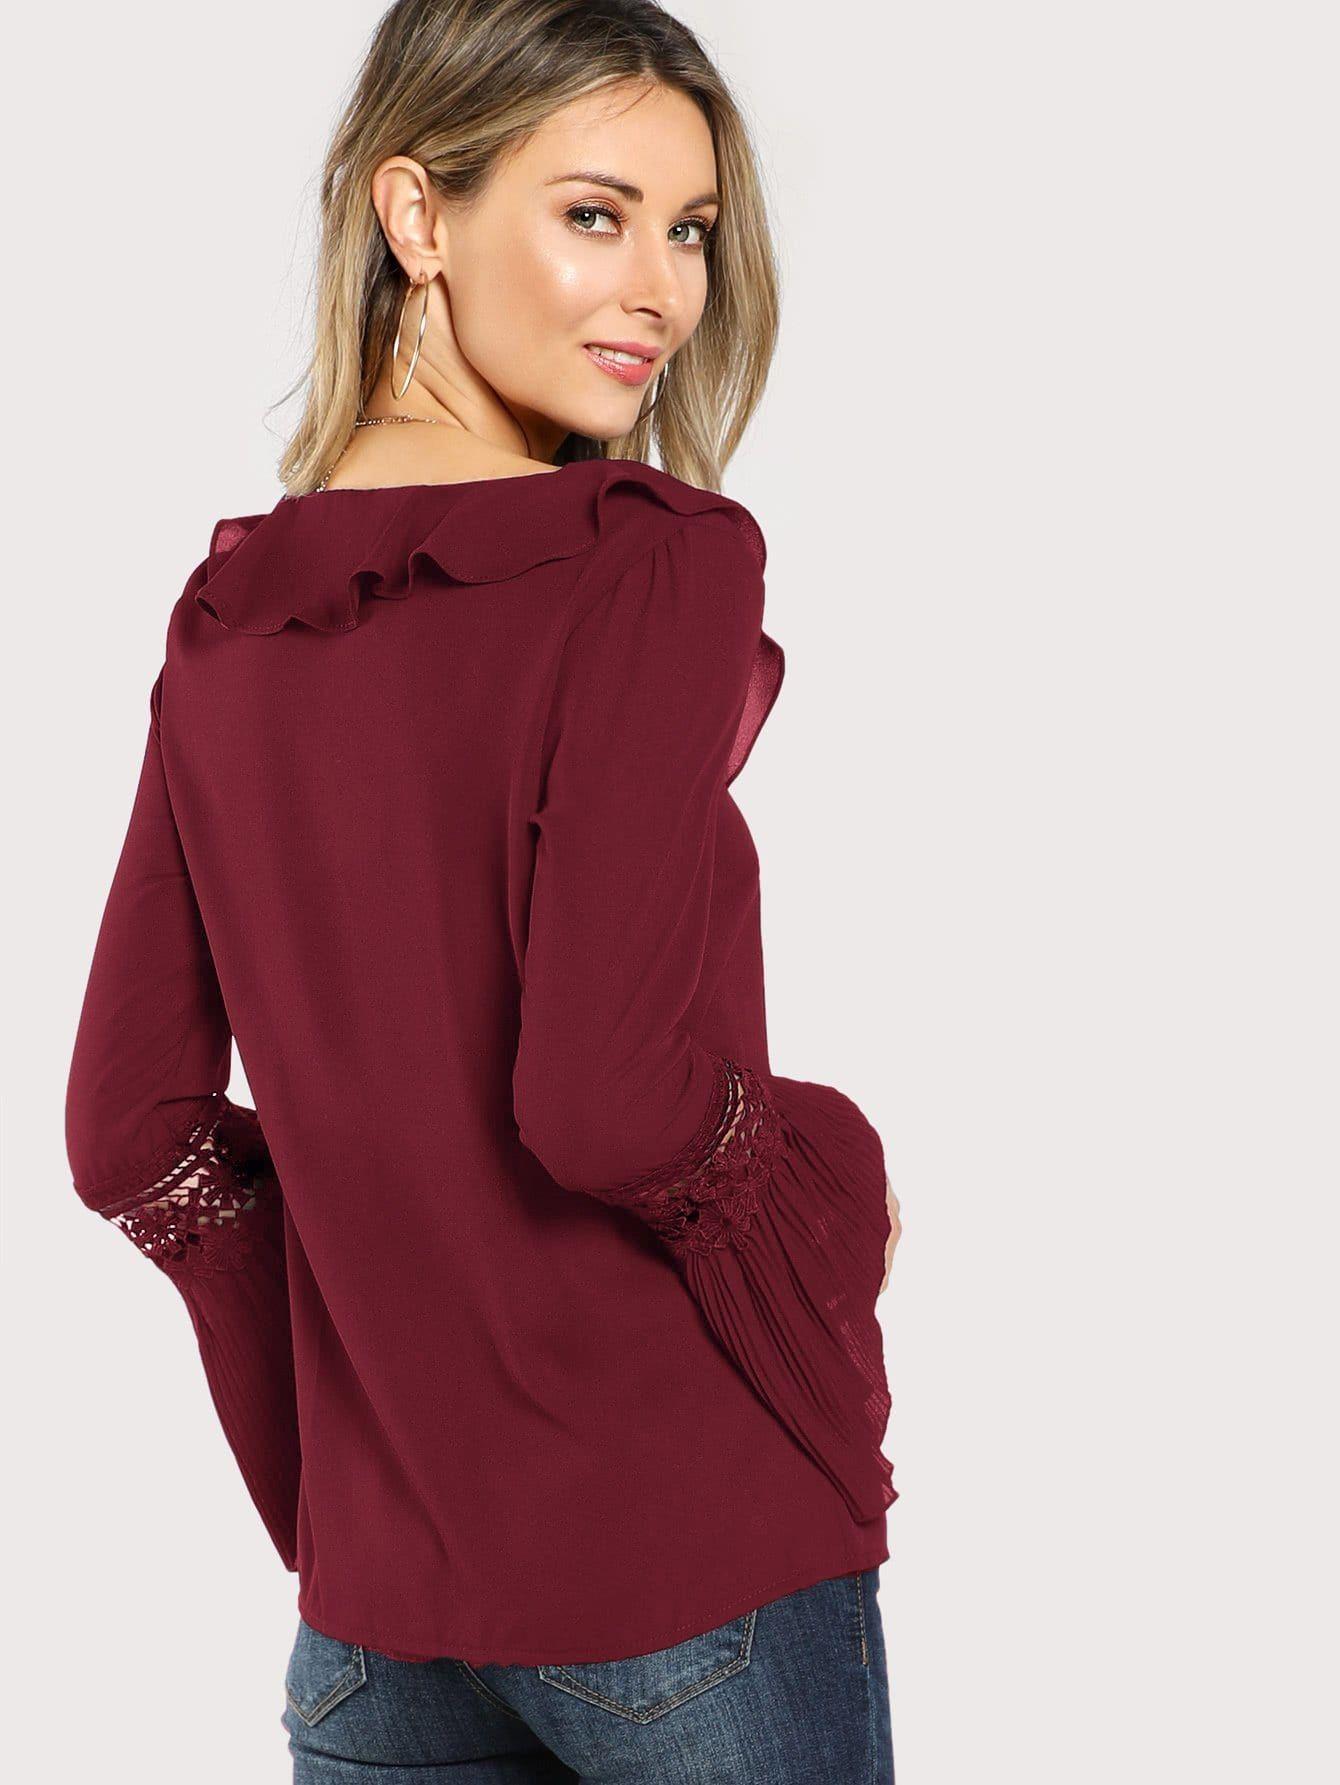 83921fa70c Ruffle Neck Lace Insert Pleated Cuff Top Lace#Neck#Ruffle | Styles ...